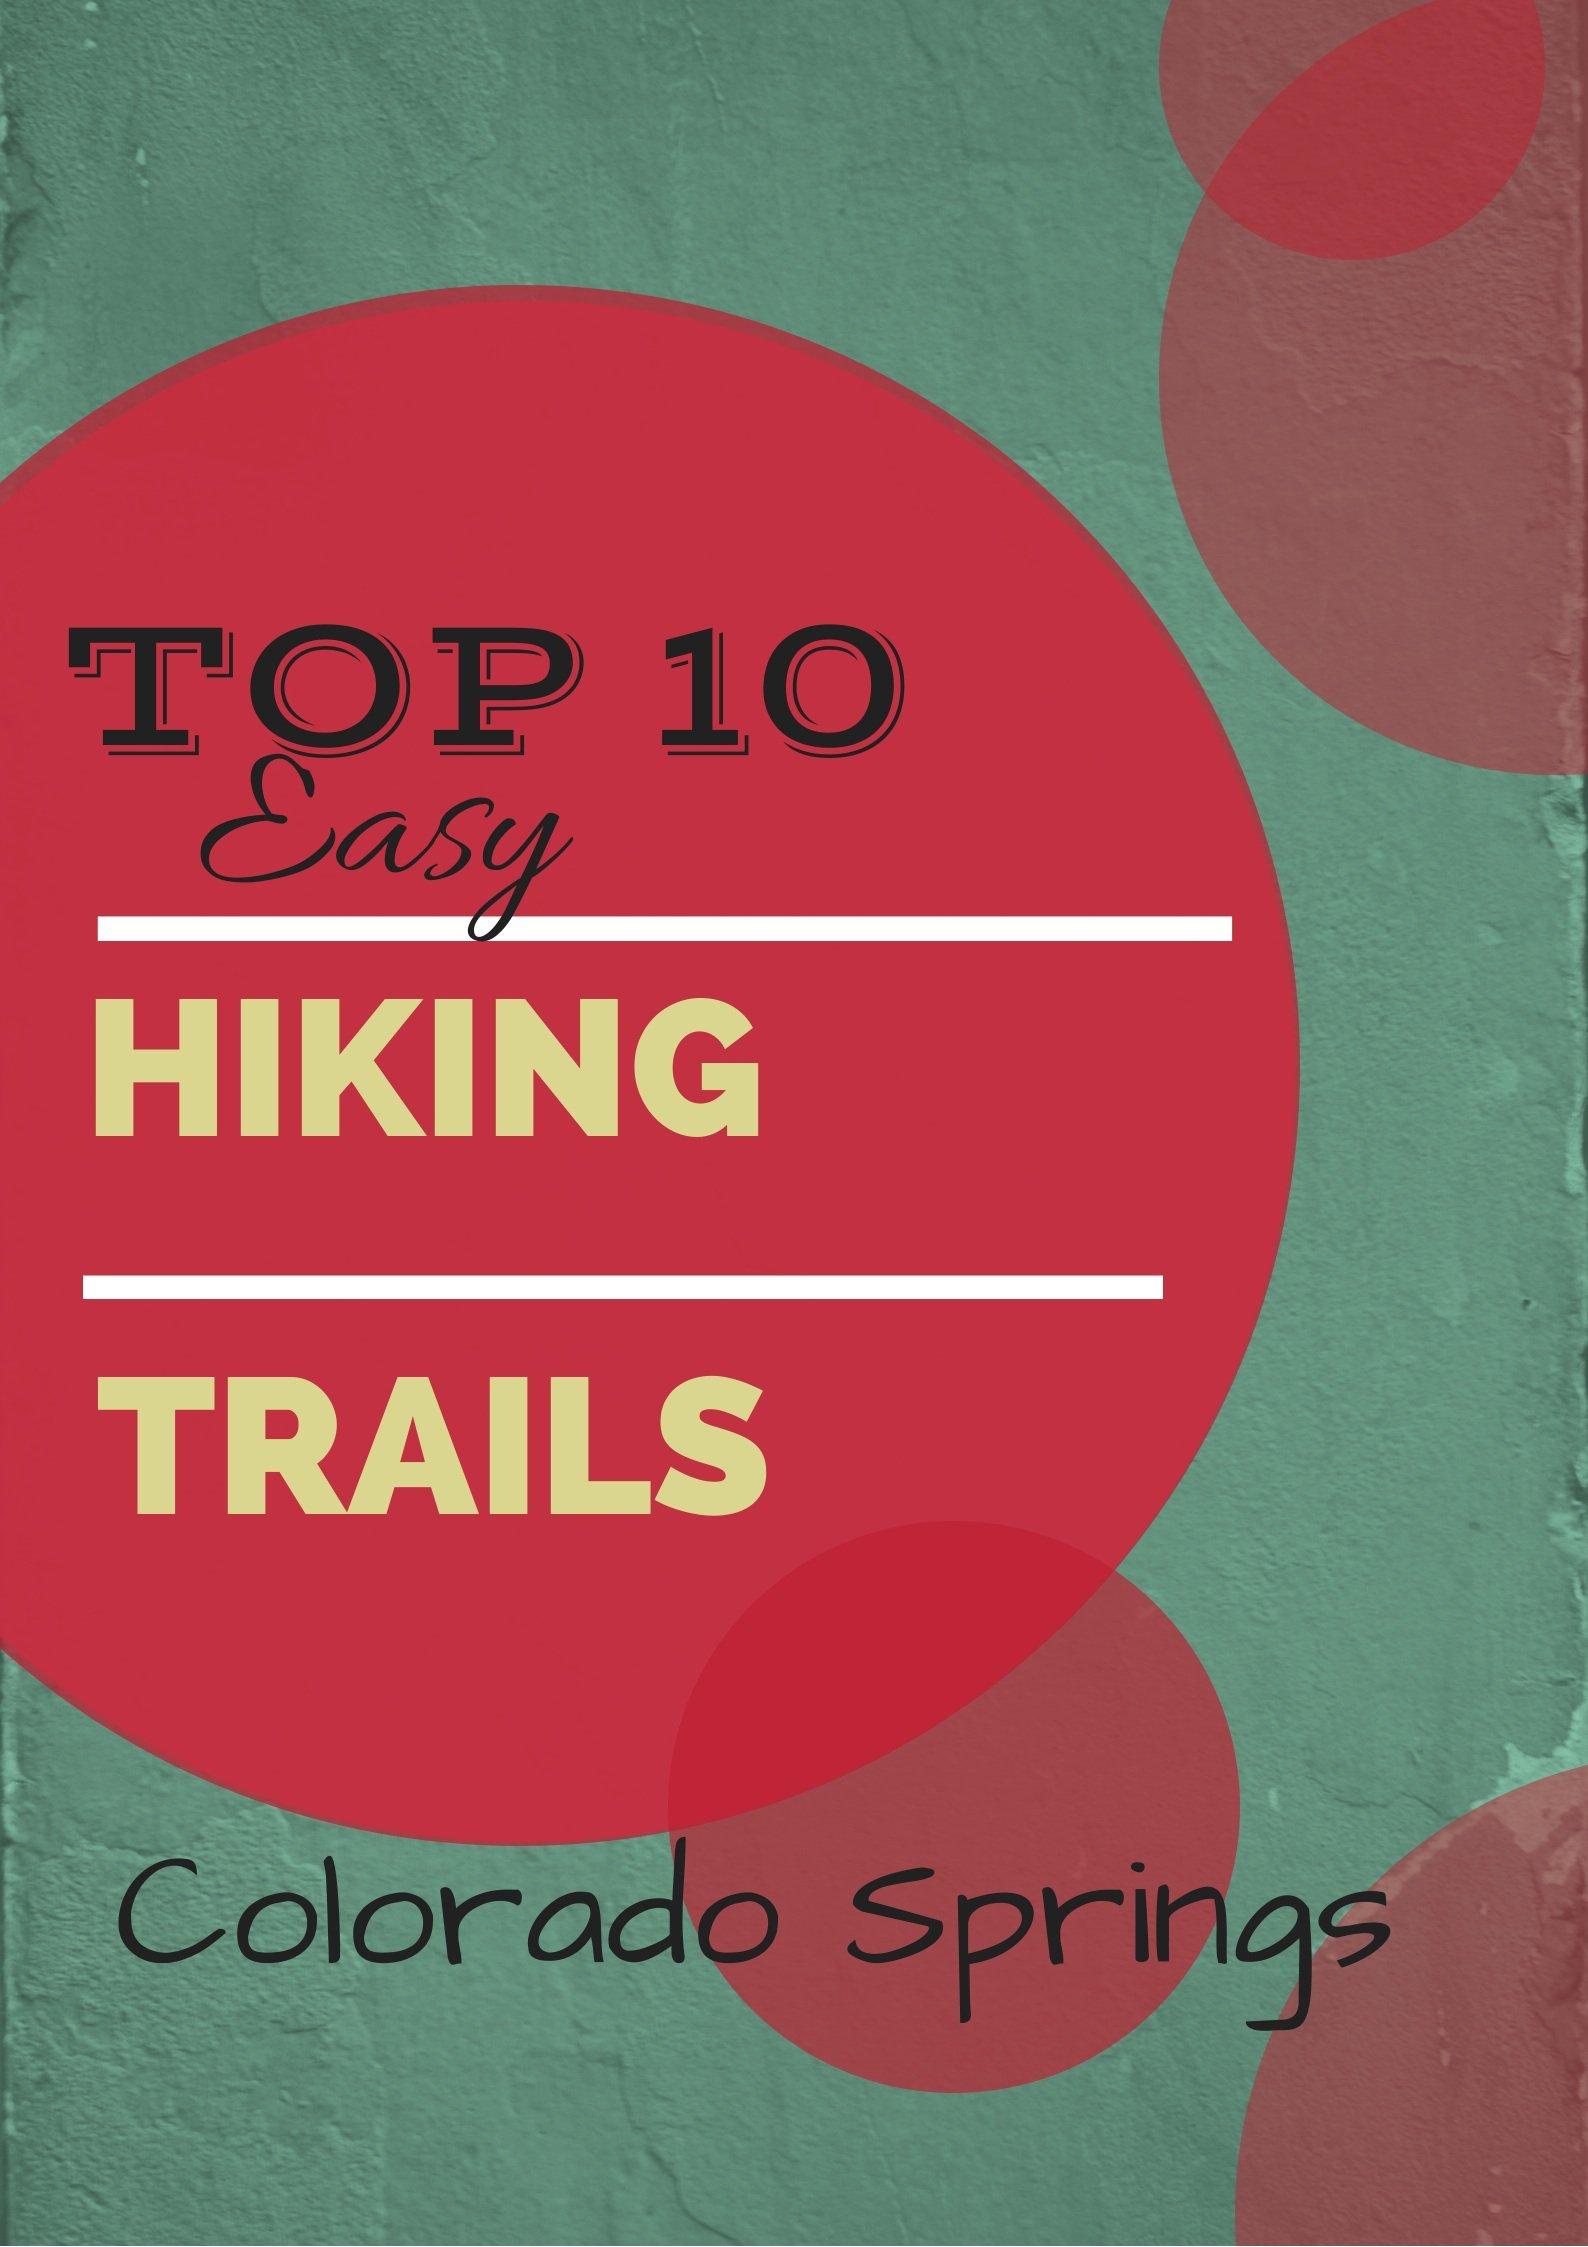 Top 10 Easy Hikes in Colorado Springs